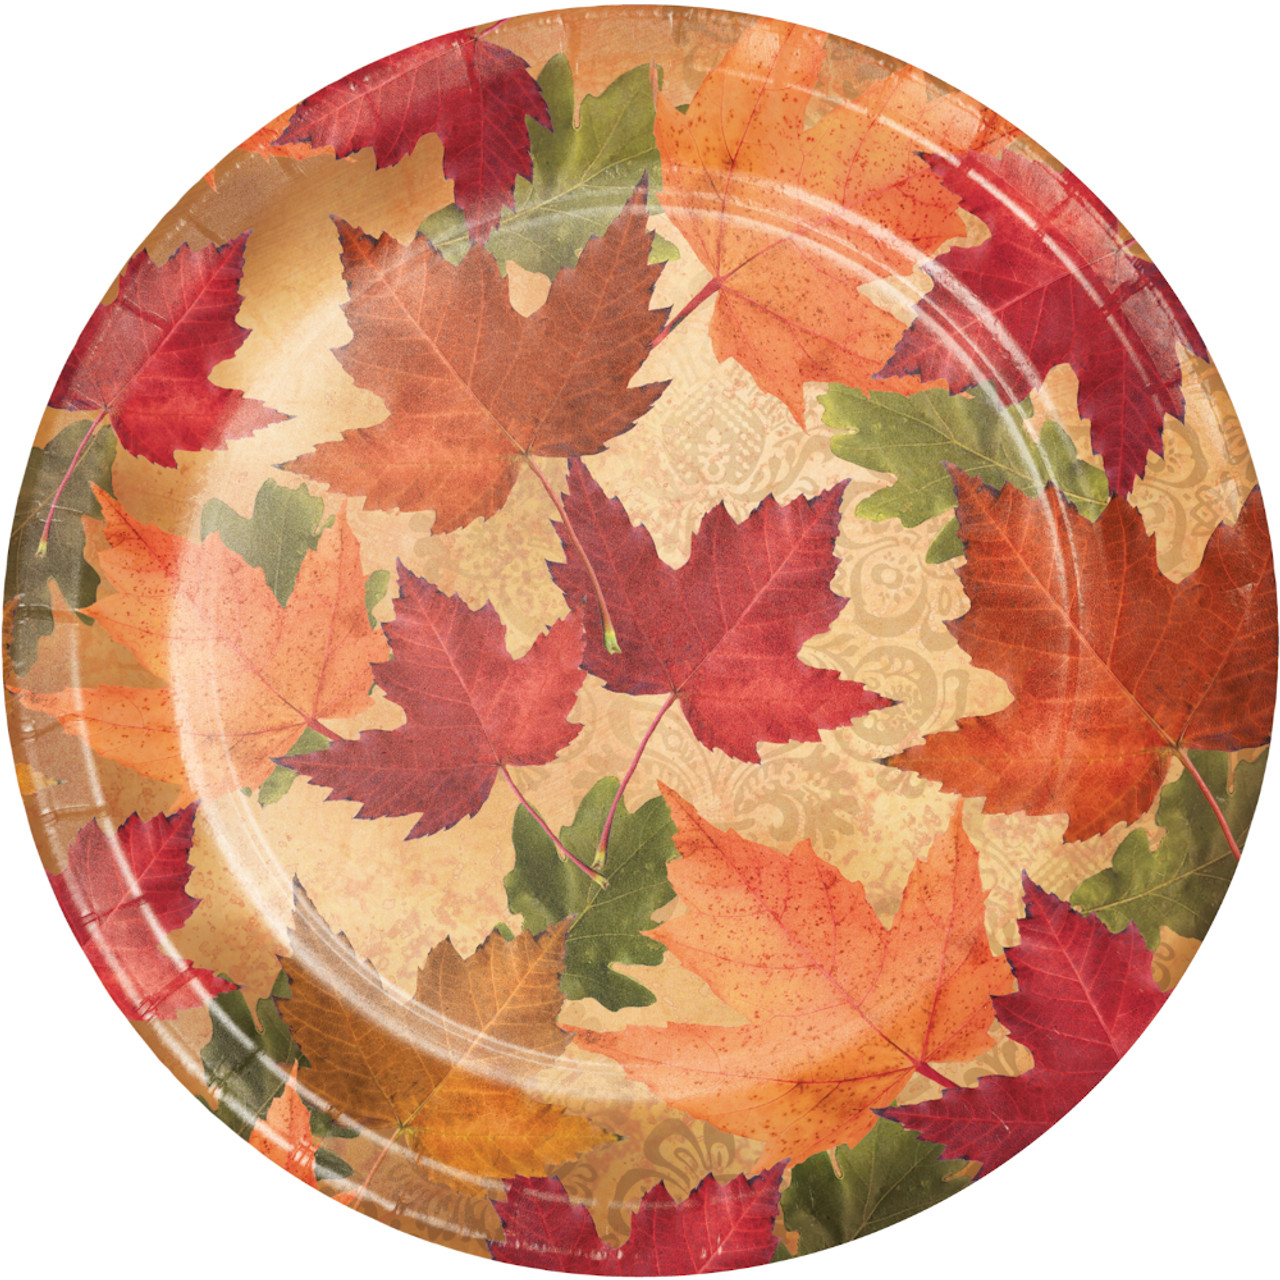 Fall Leaf Cake Plates